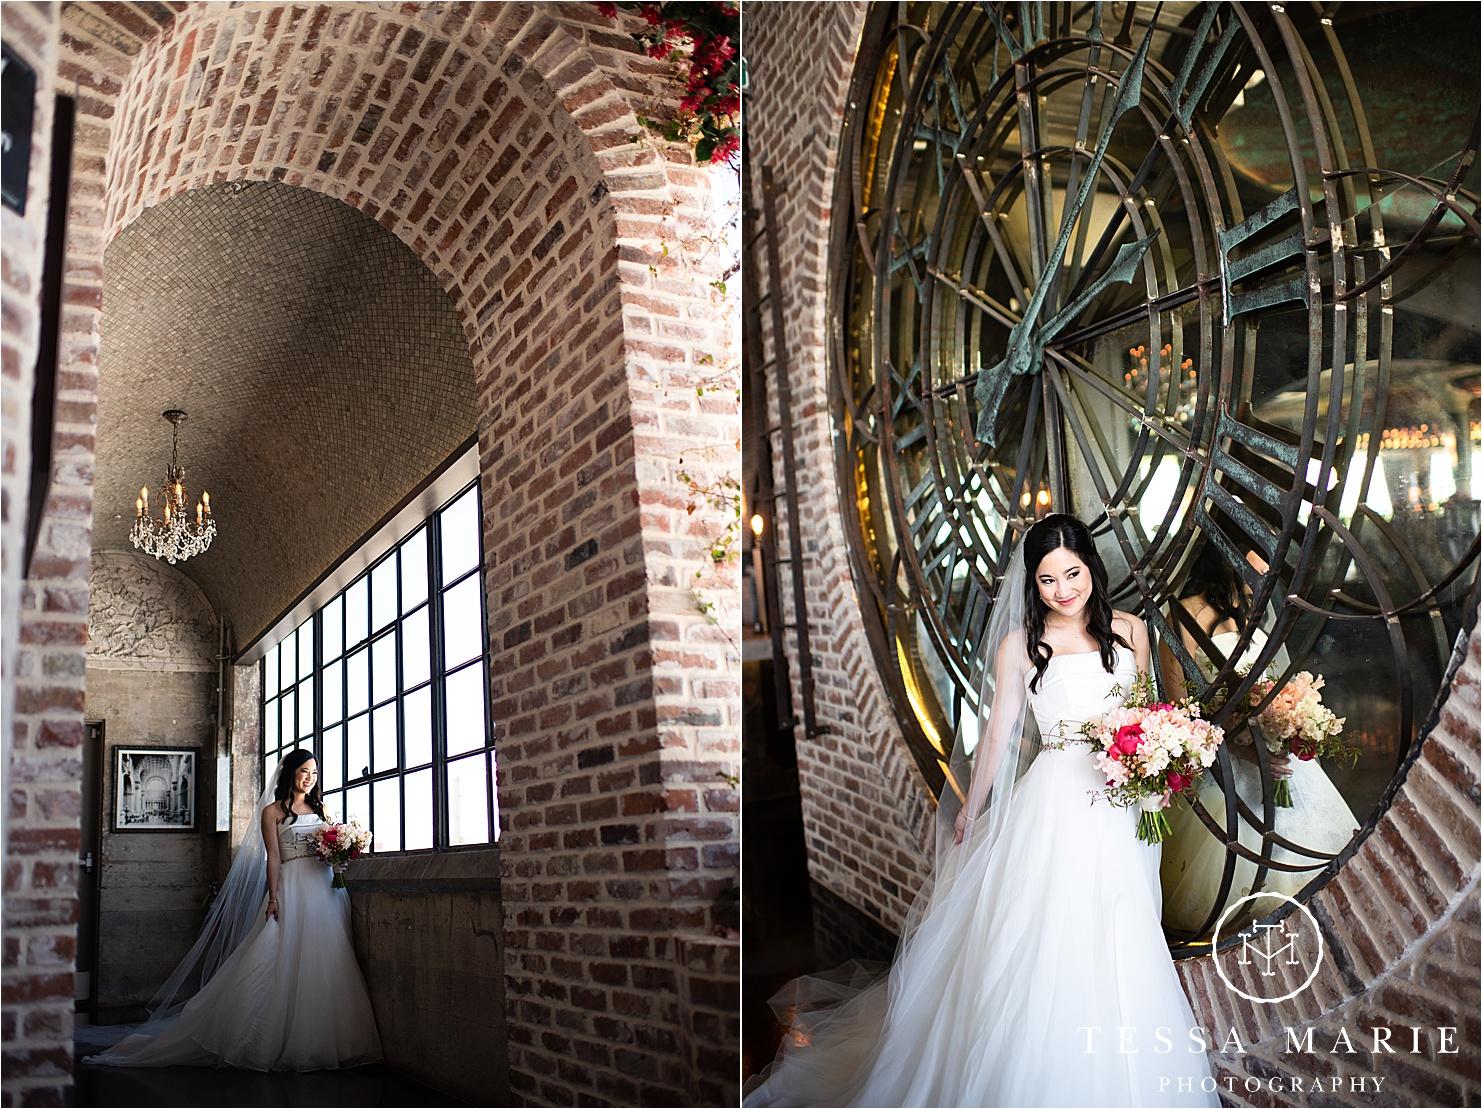 Tessa_marie_weddings_houston_wedding_photographer_The_astorian_0038.jpg